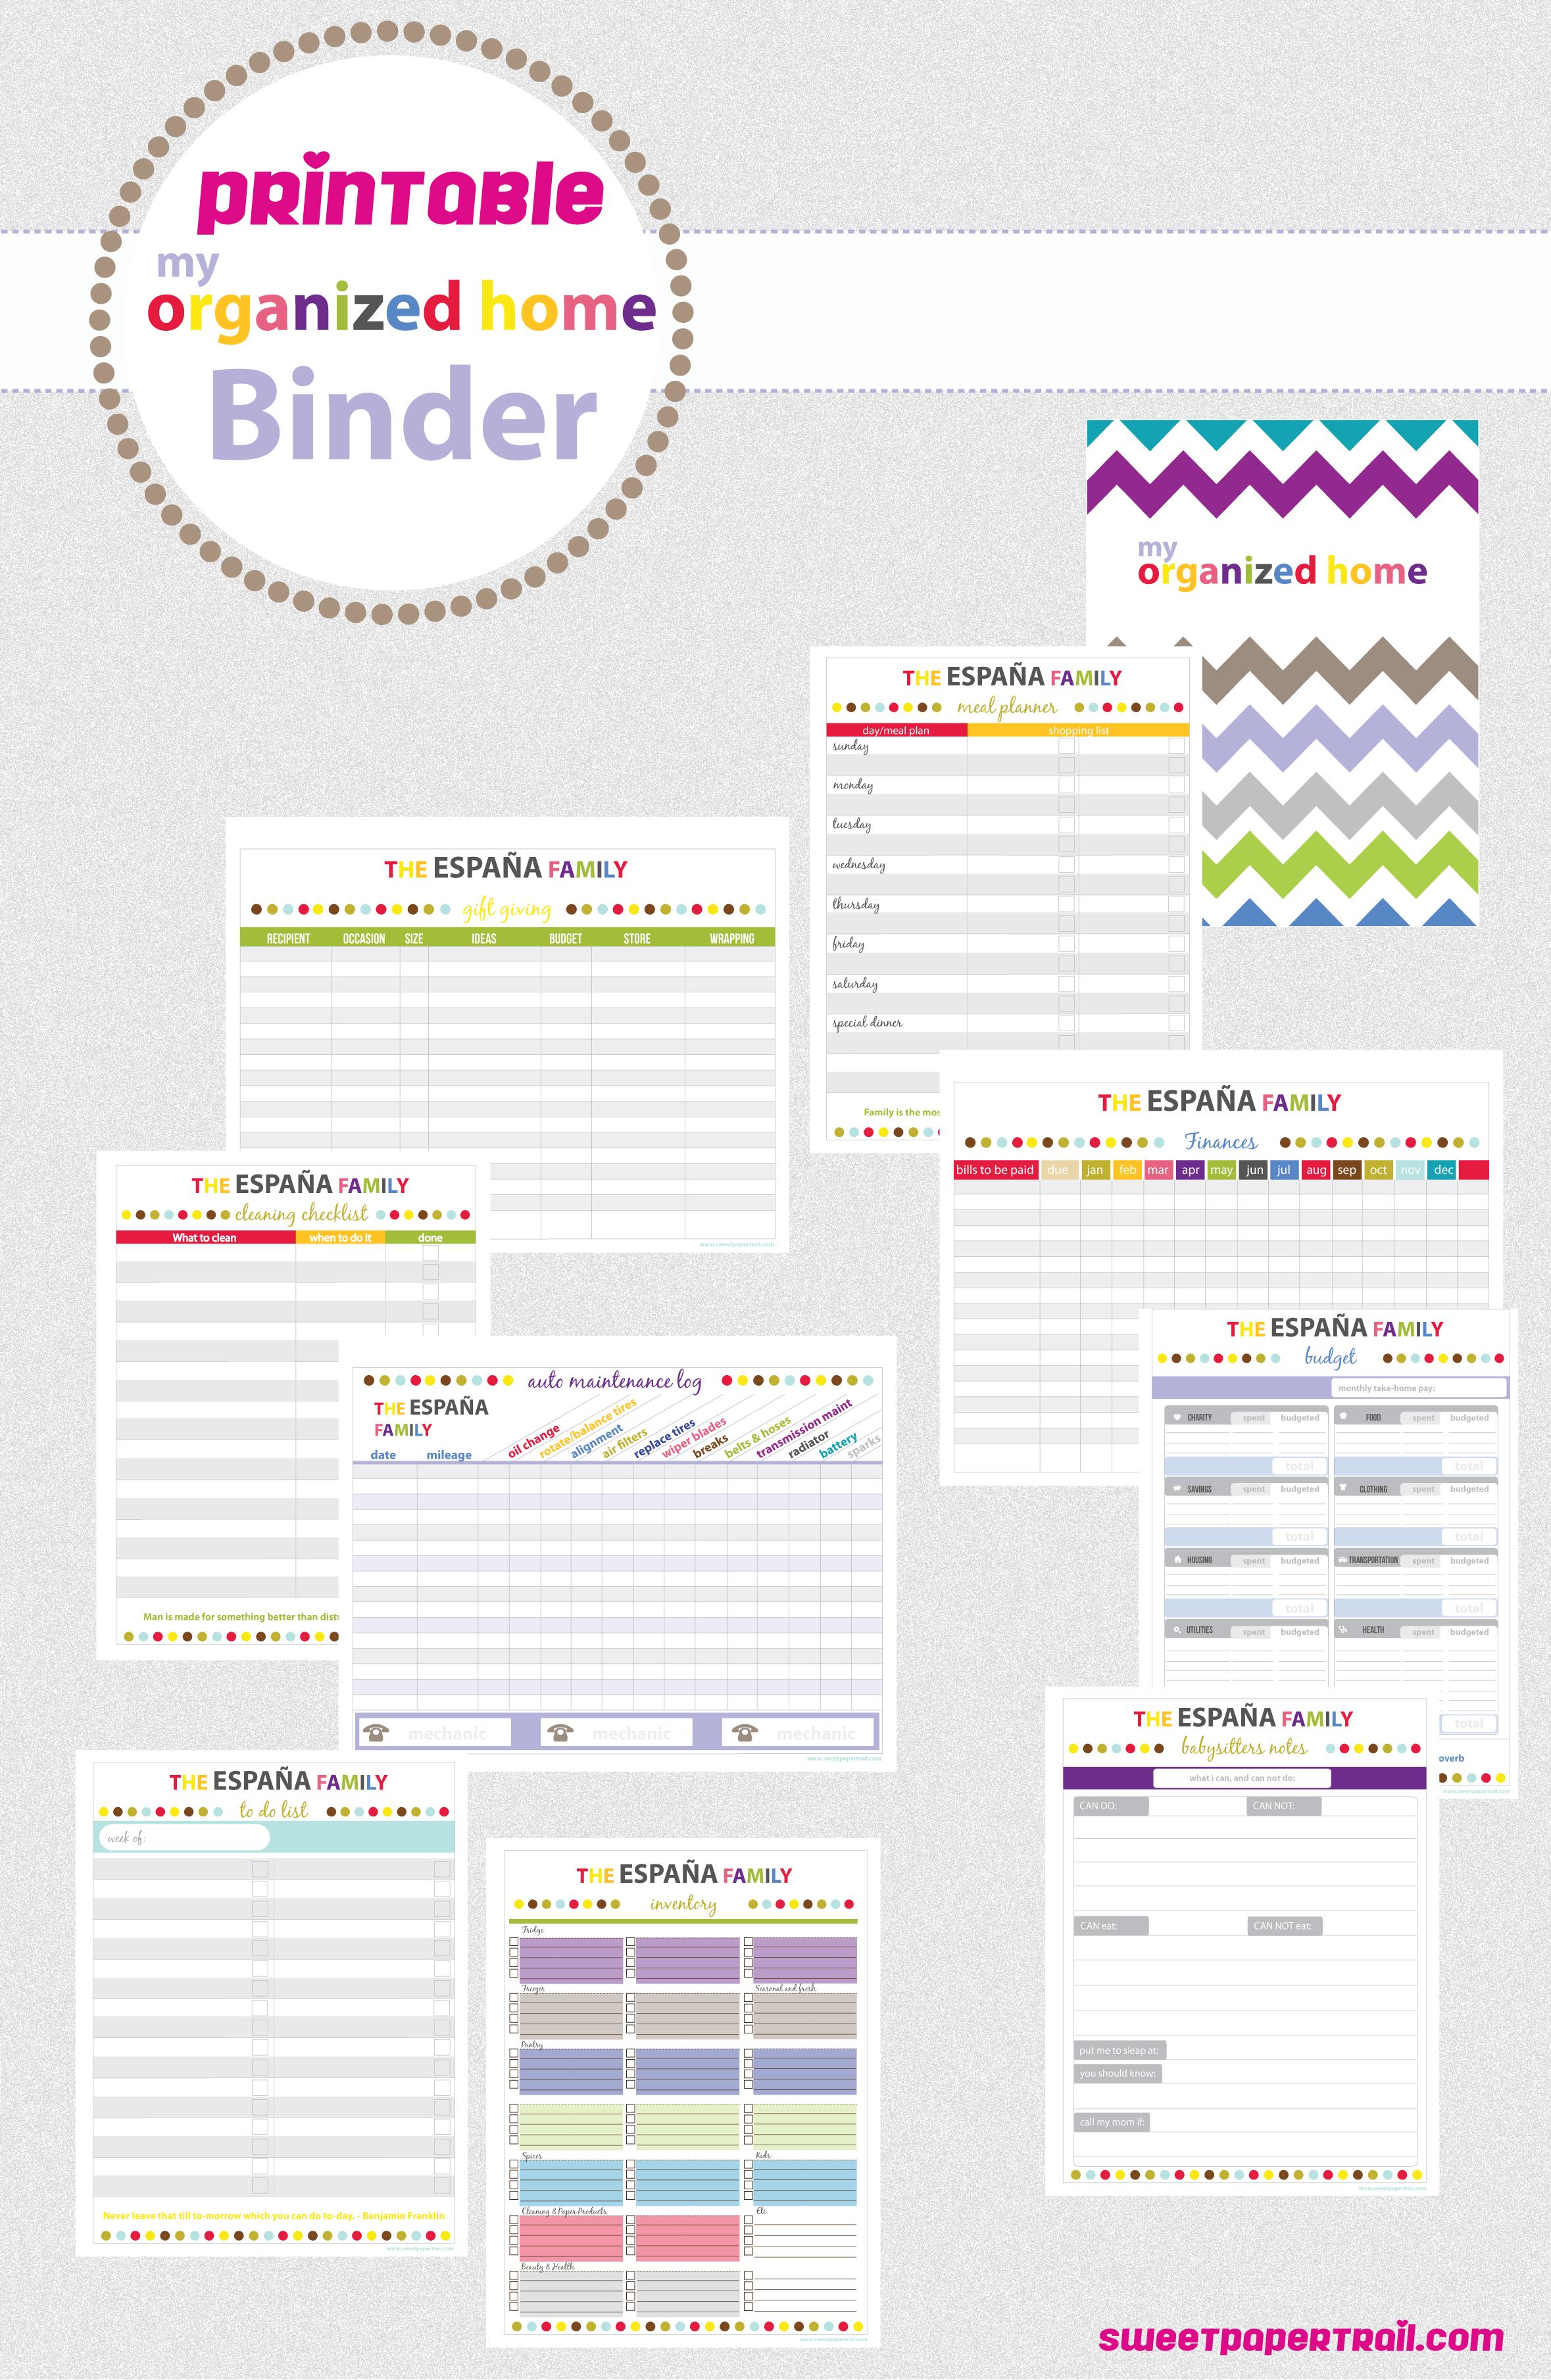 7 best images of binder organization printable planner for Home planner online free